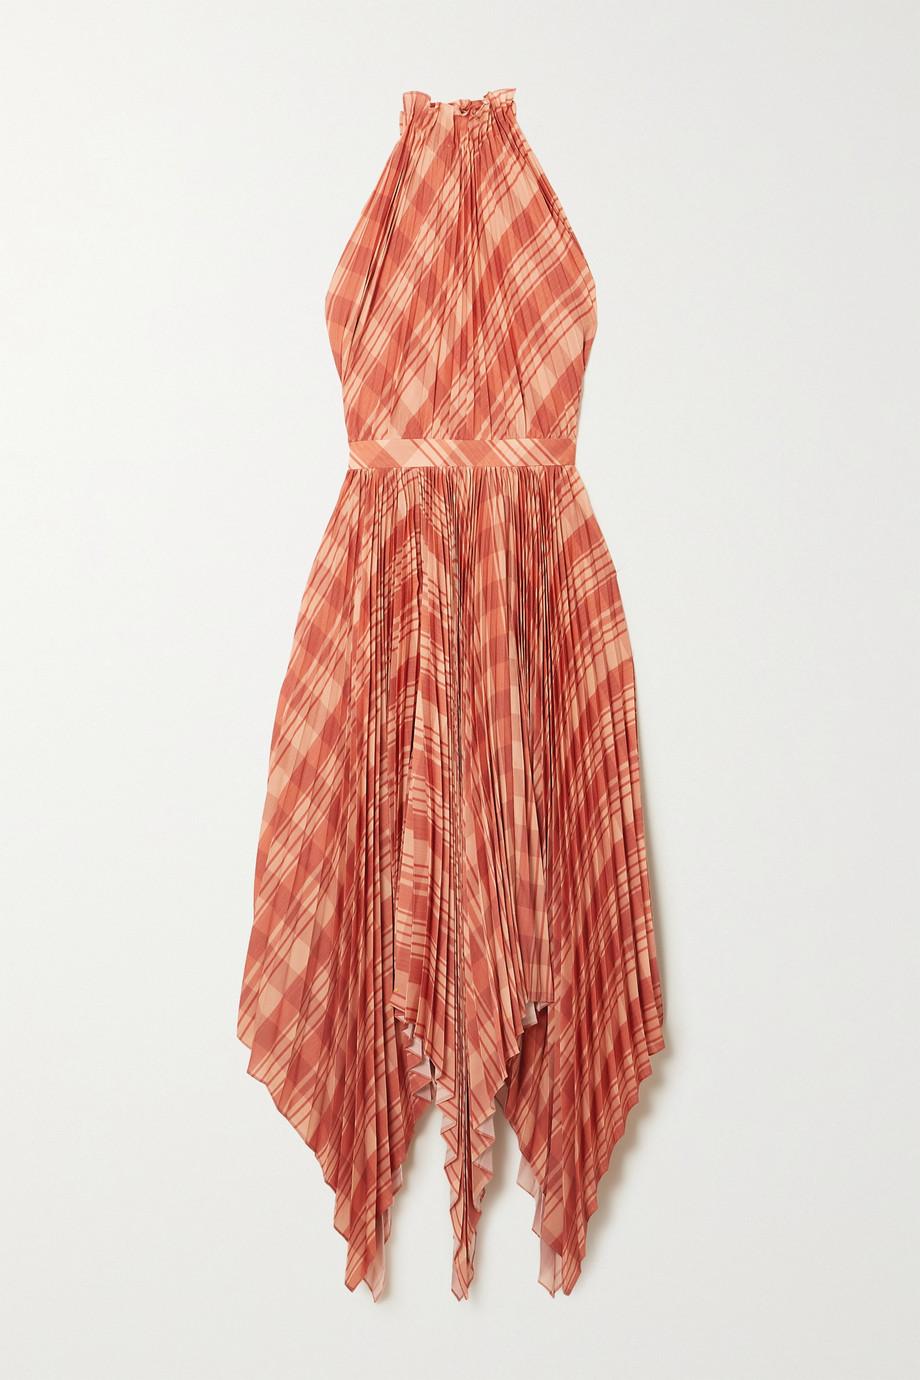 Altuzarra Dahlia asymmetric checked plissé-crepe de chine halterneck midi dress